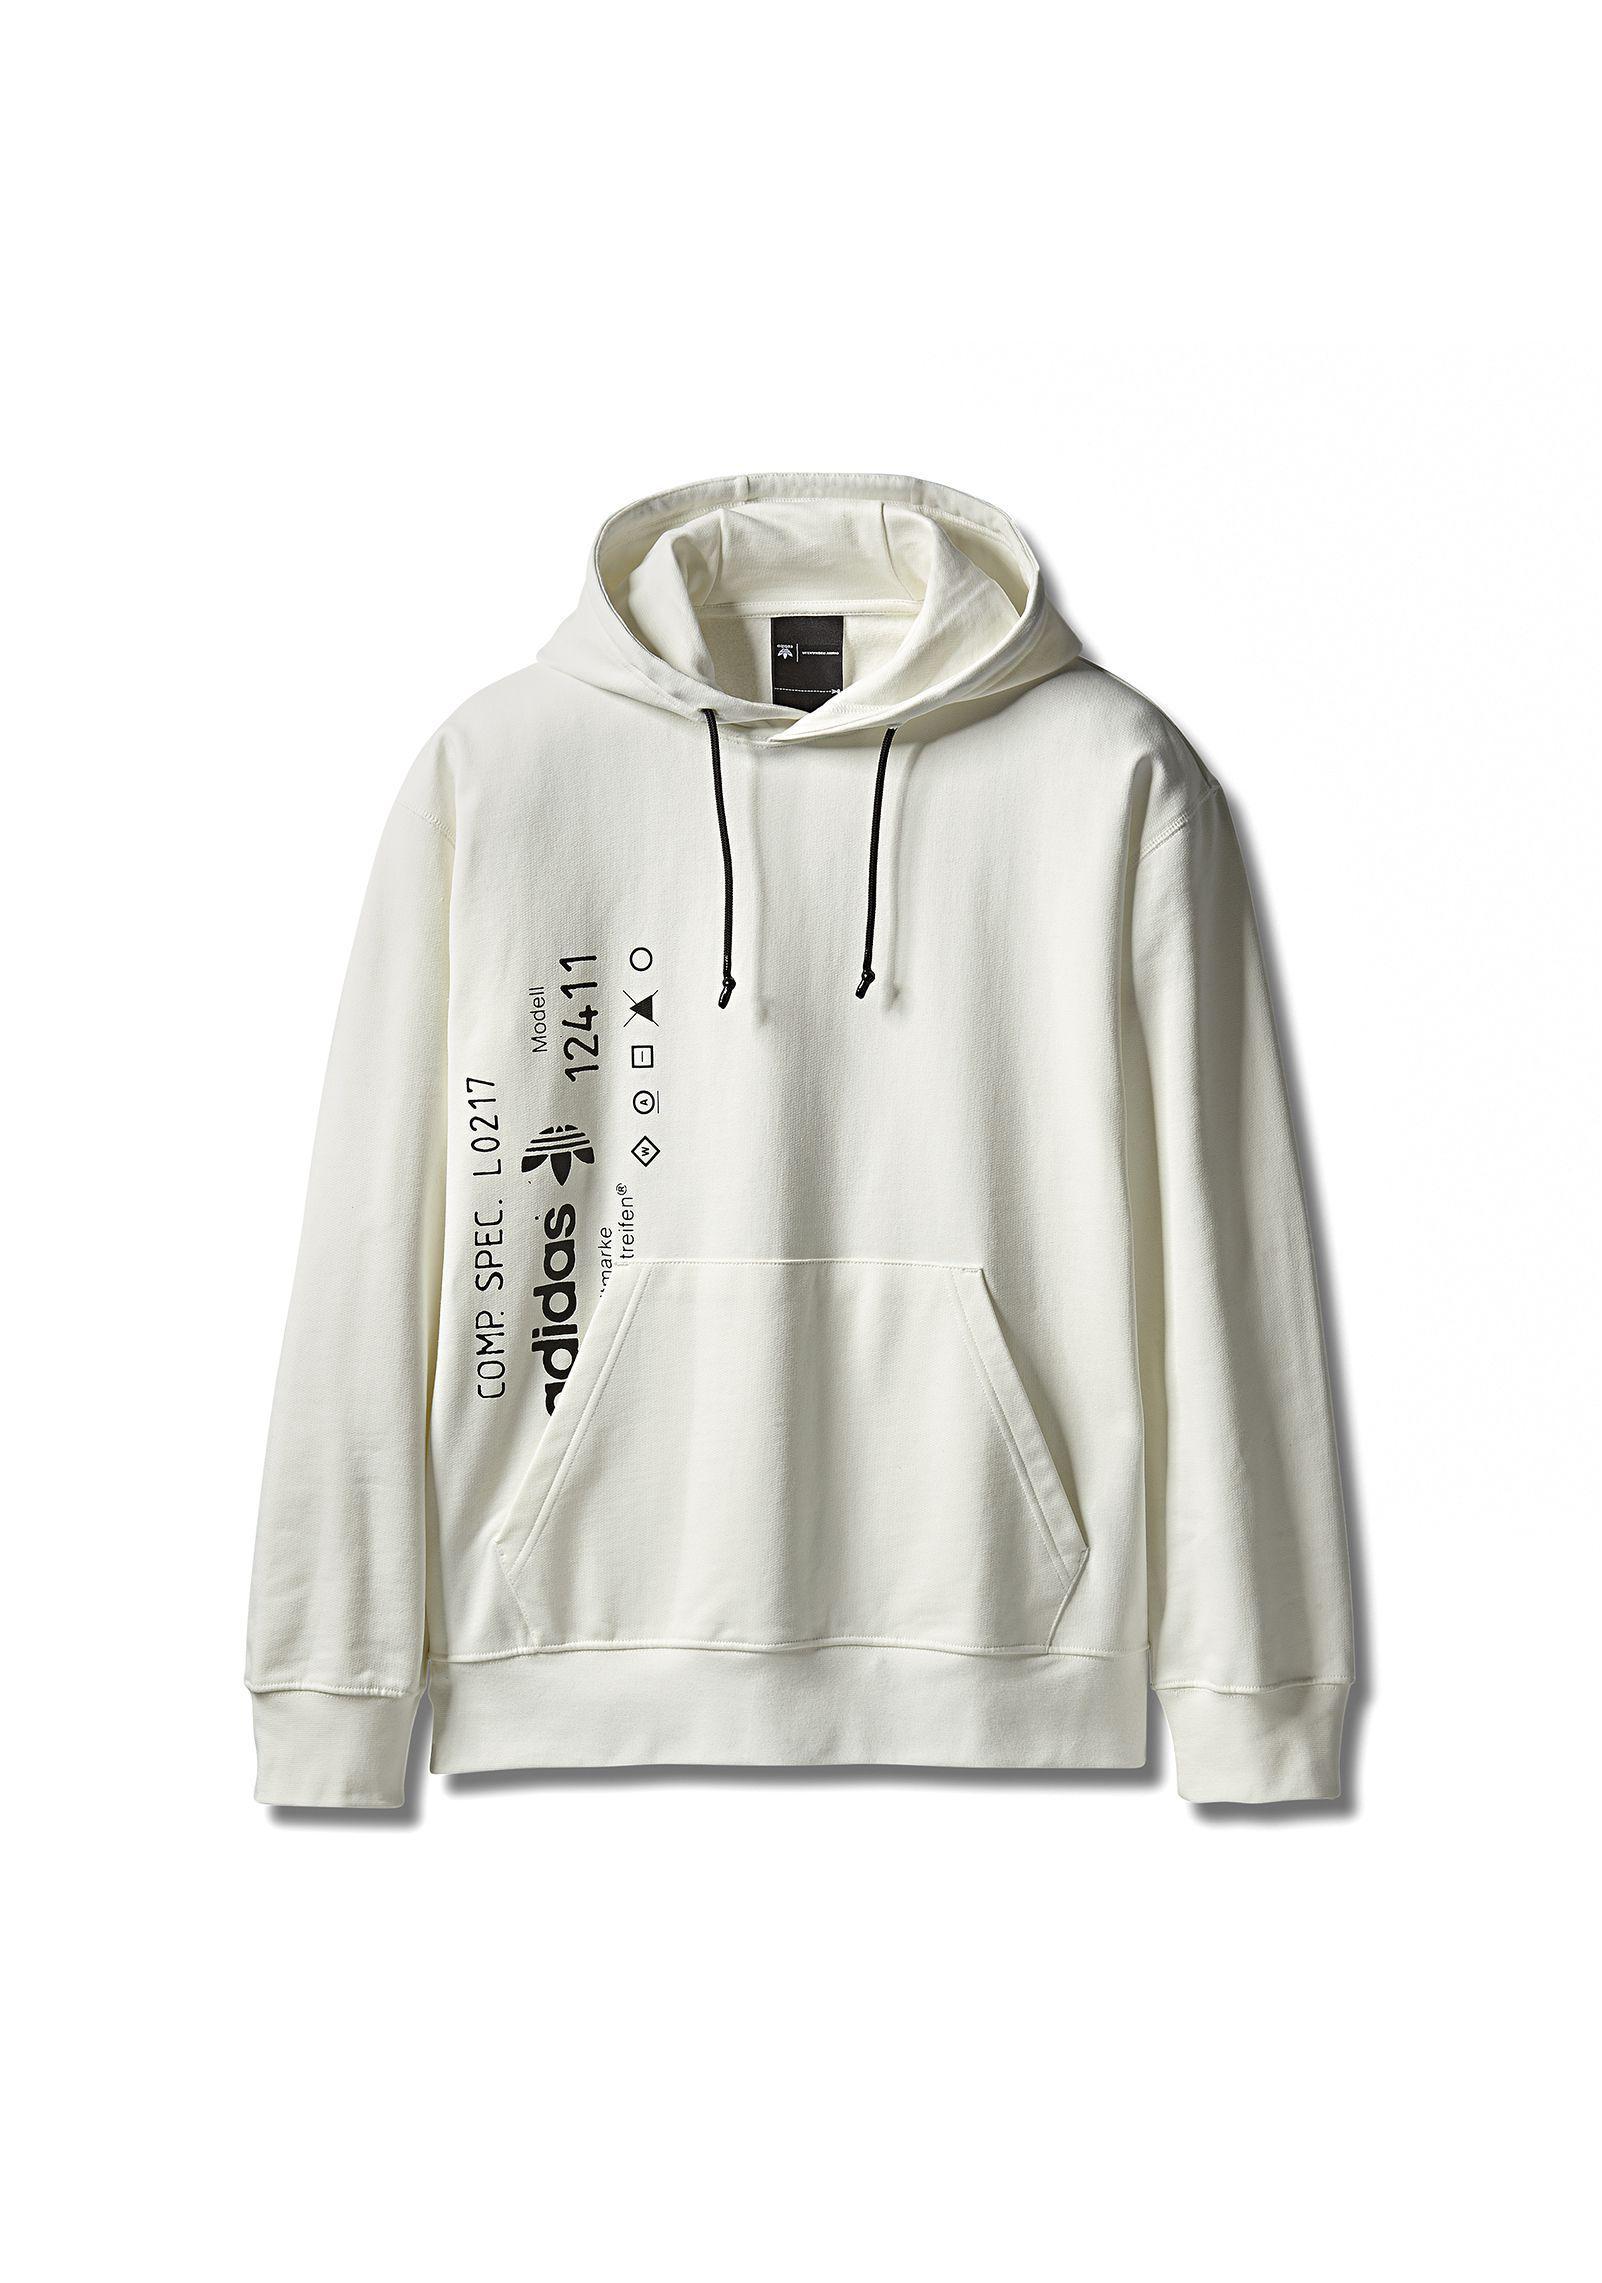 Originals Adidas Wang Alexander Men Graphic For White Aw By Hoodie zMqpUSVG